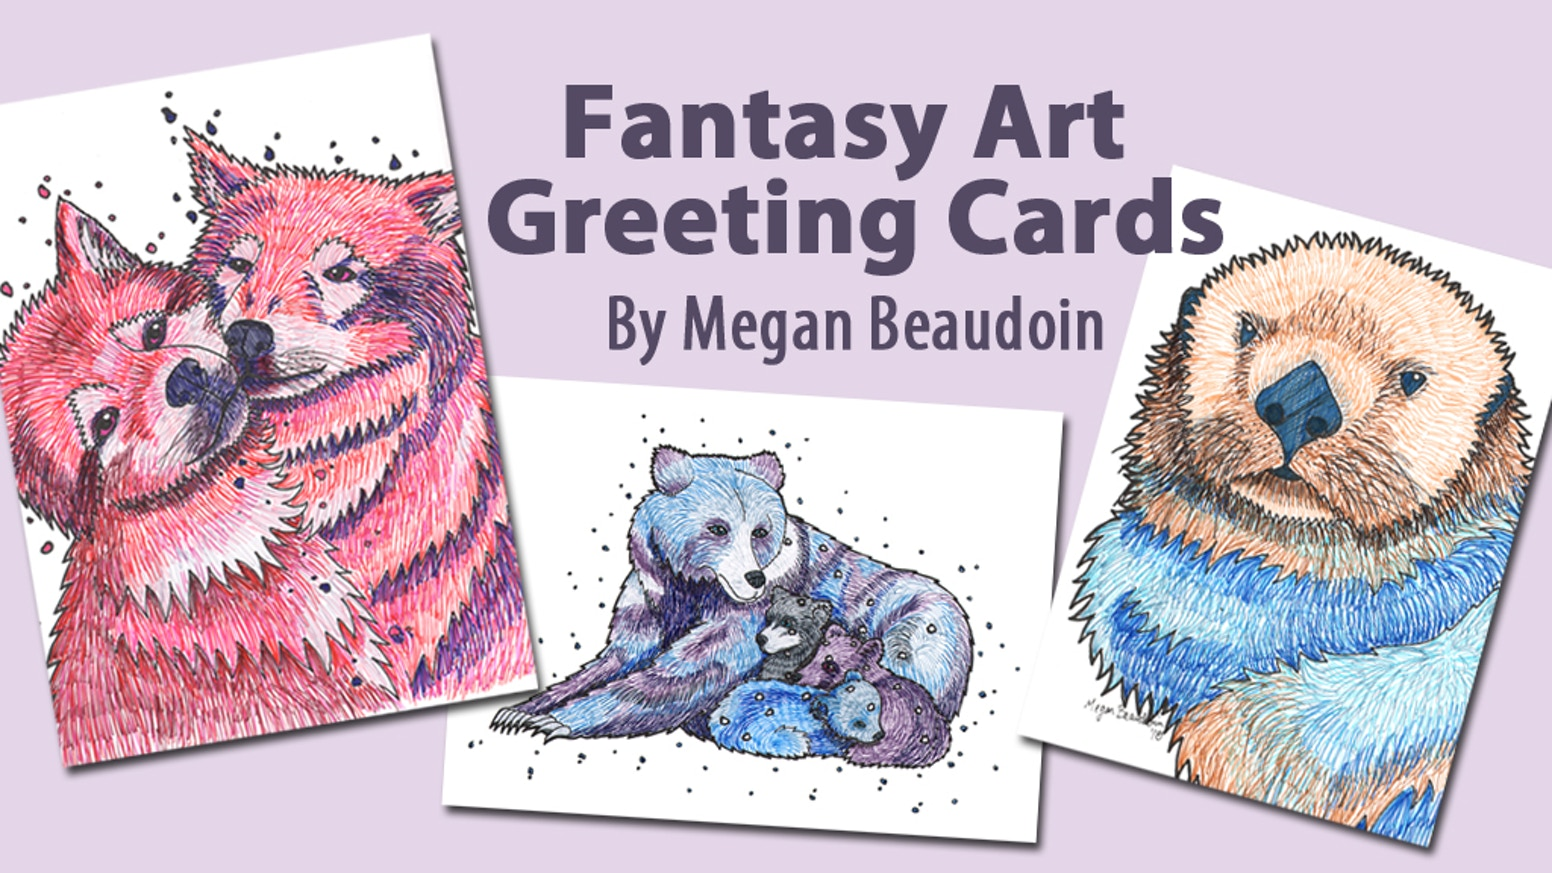 Fantasy Art Greeting Cards By Megan Beaudoin Kickstarter